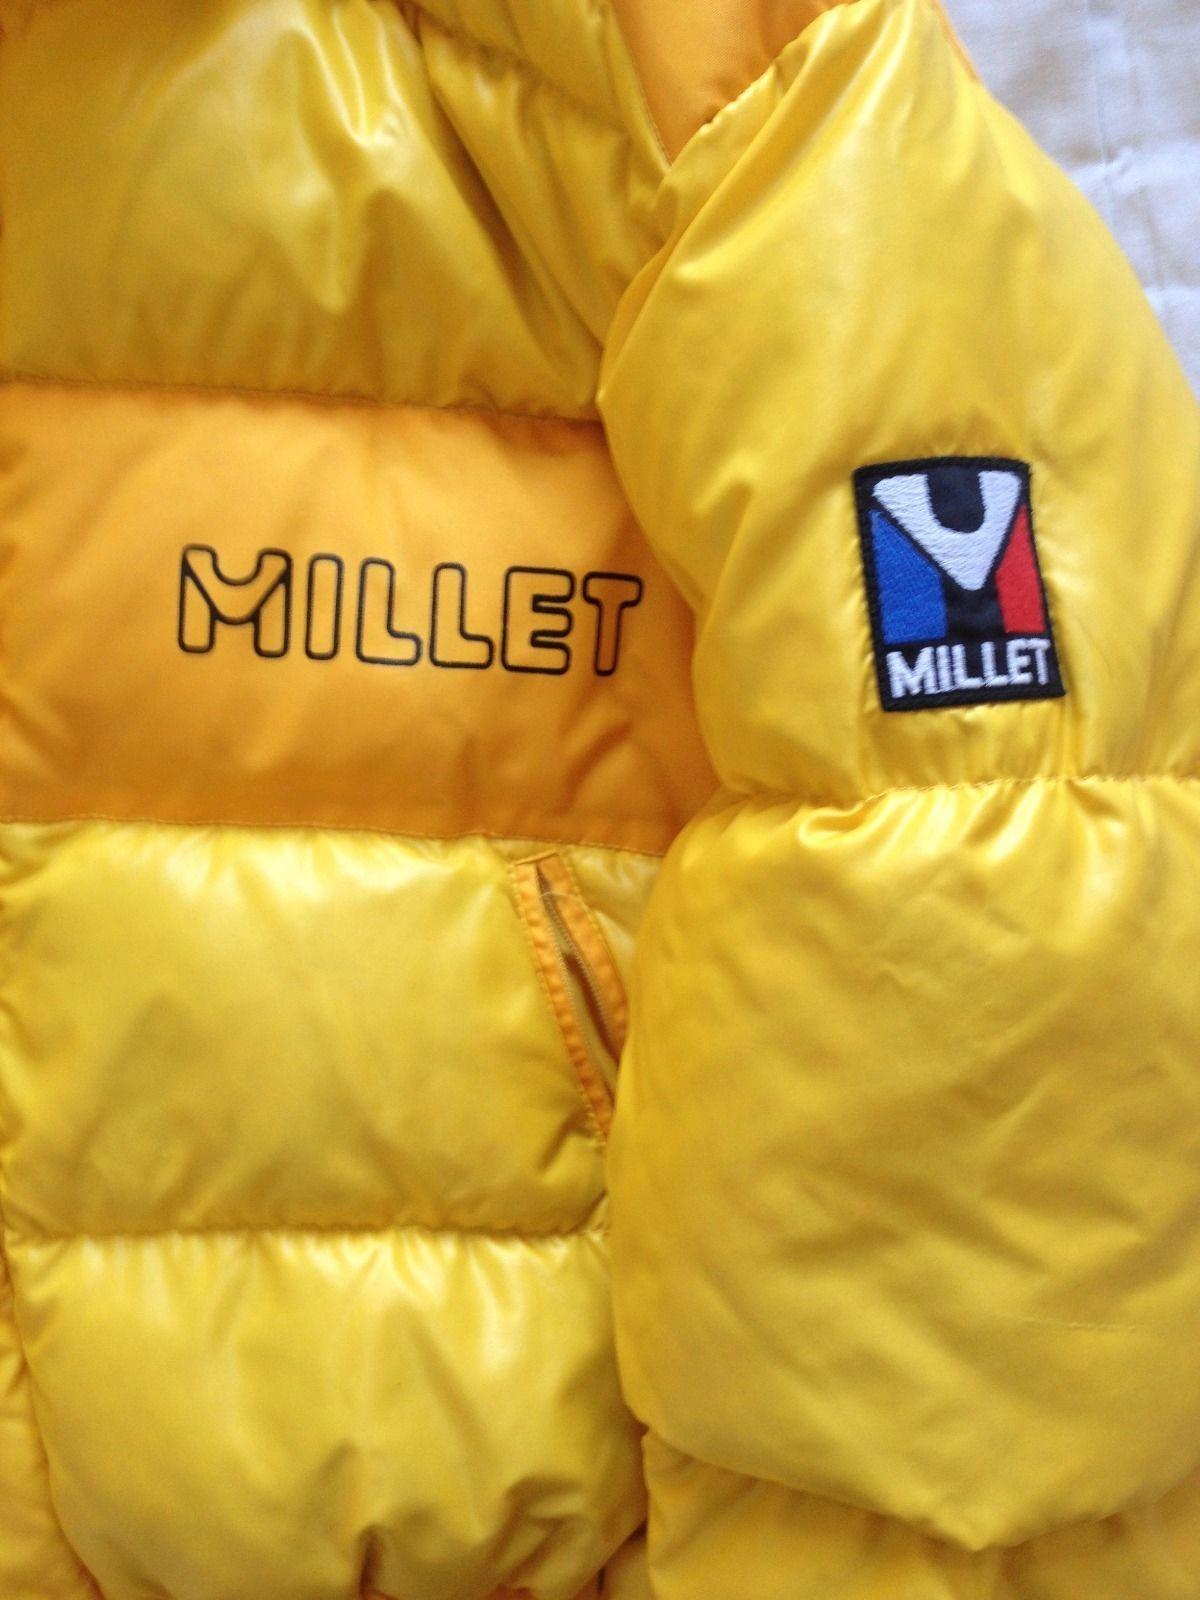 Vintage Millet doudoune down jacket size 3 (medium)   eBay   Oh ... 22216a1efe6